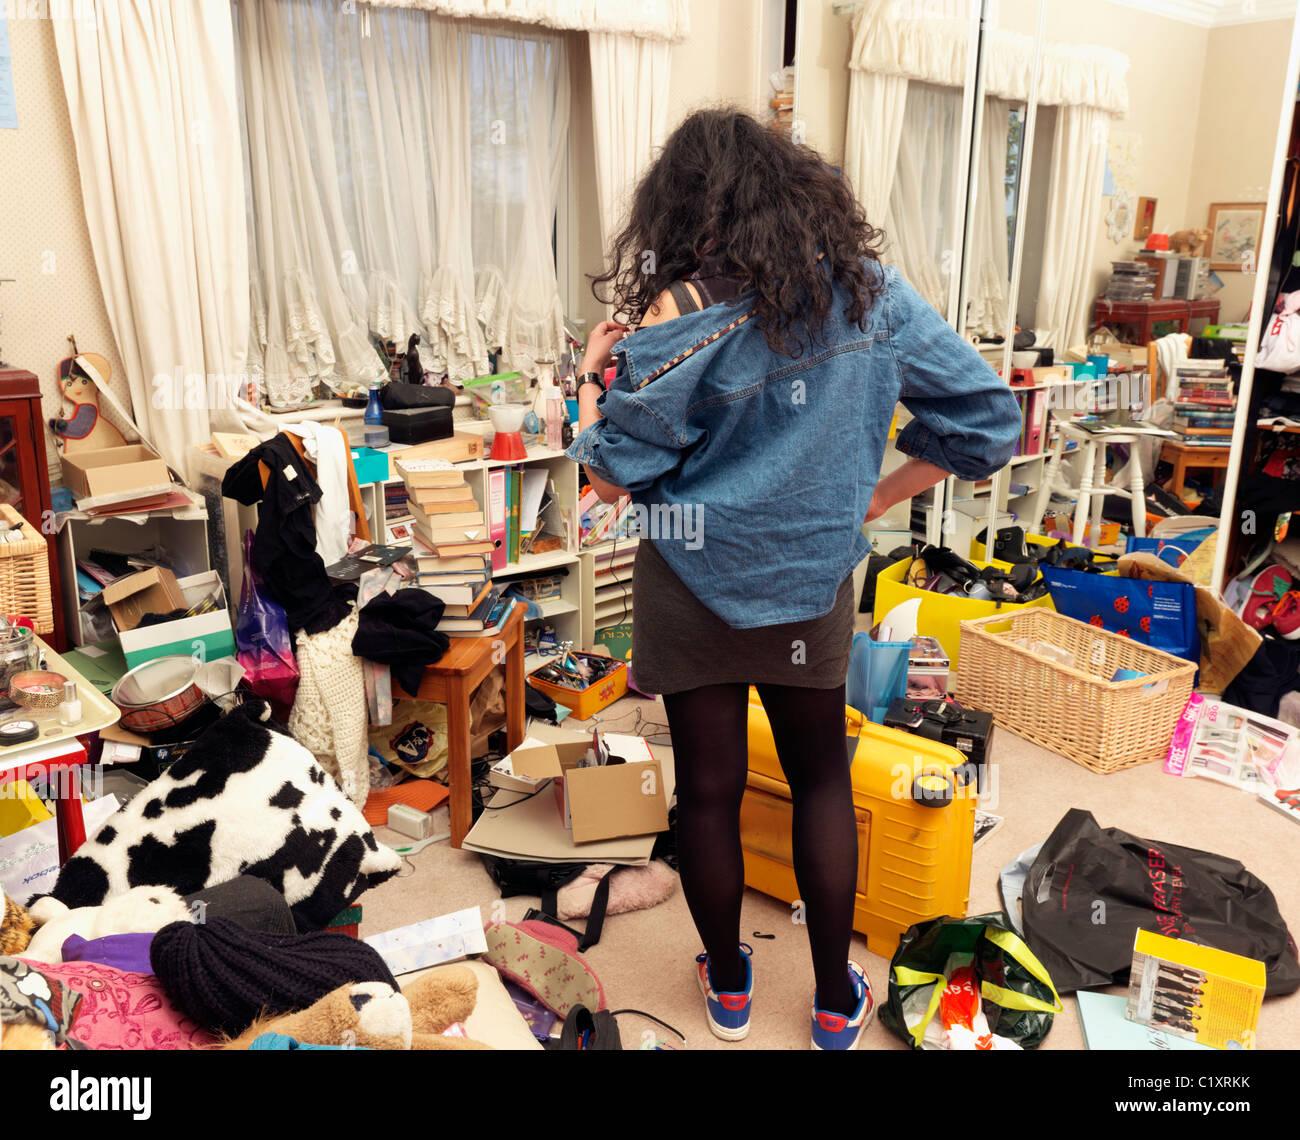 Teenage Girl In Untidy Bedroom - Stock Image